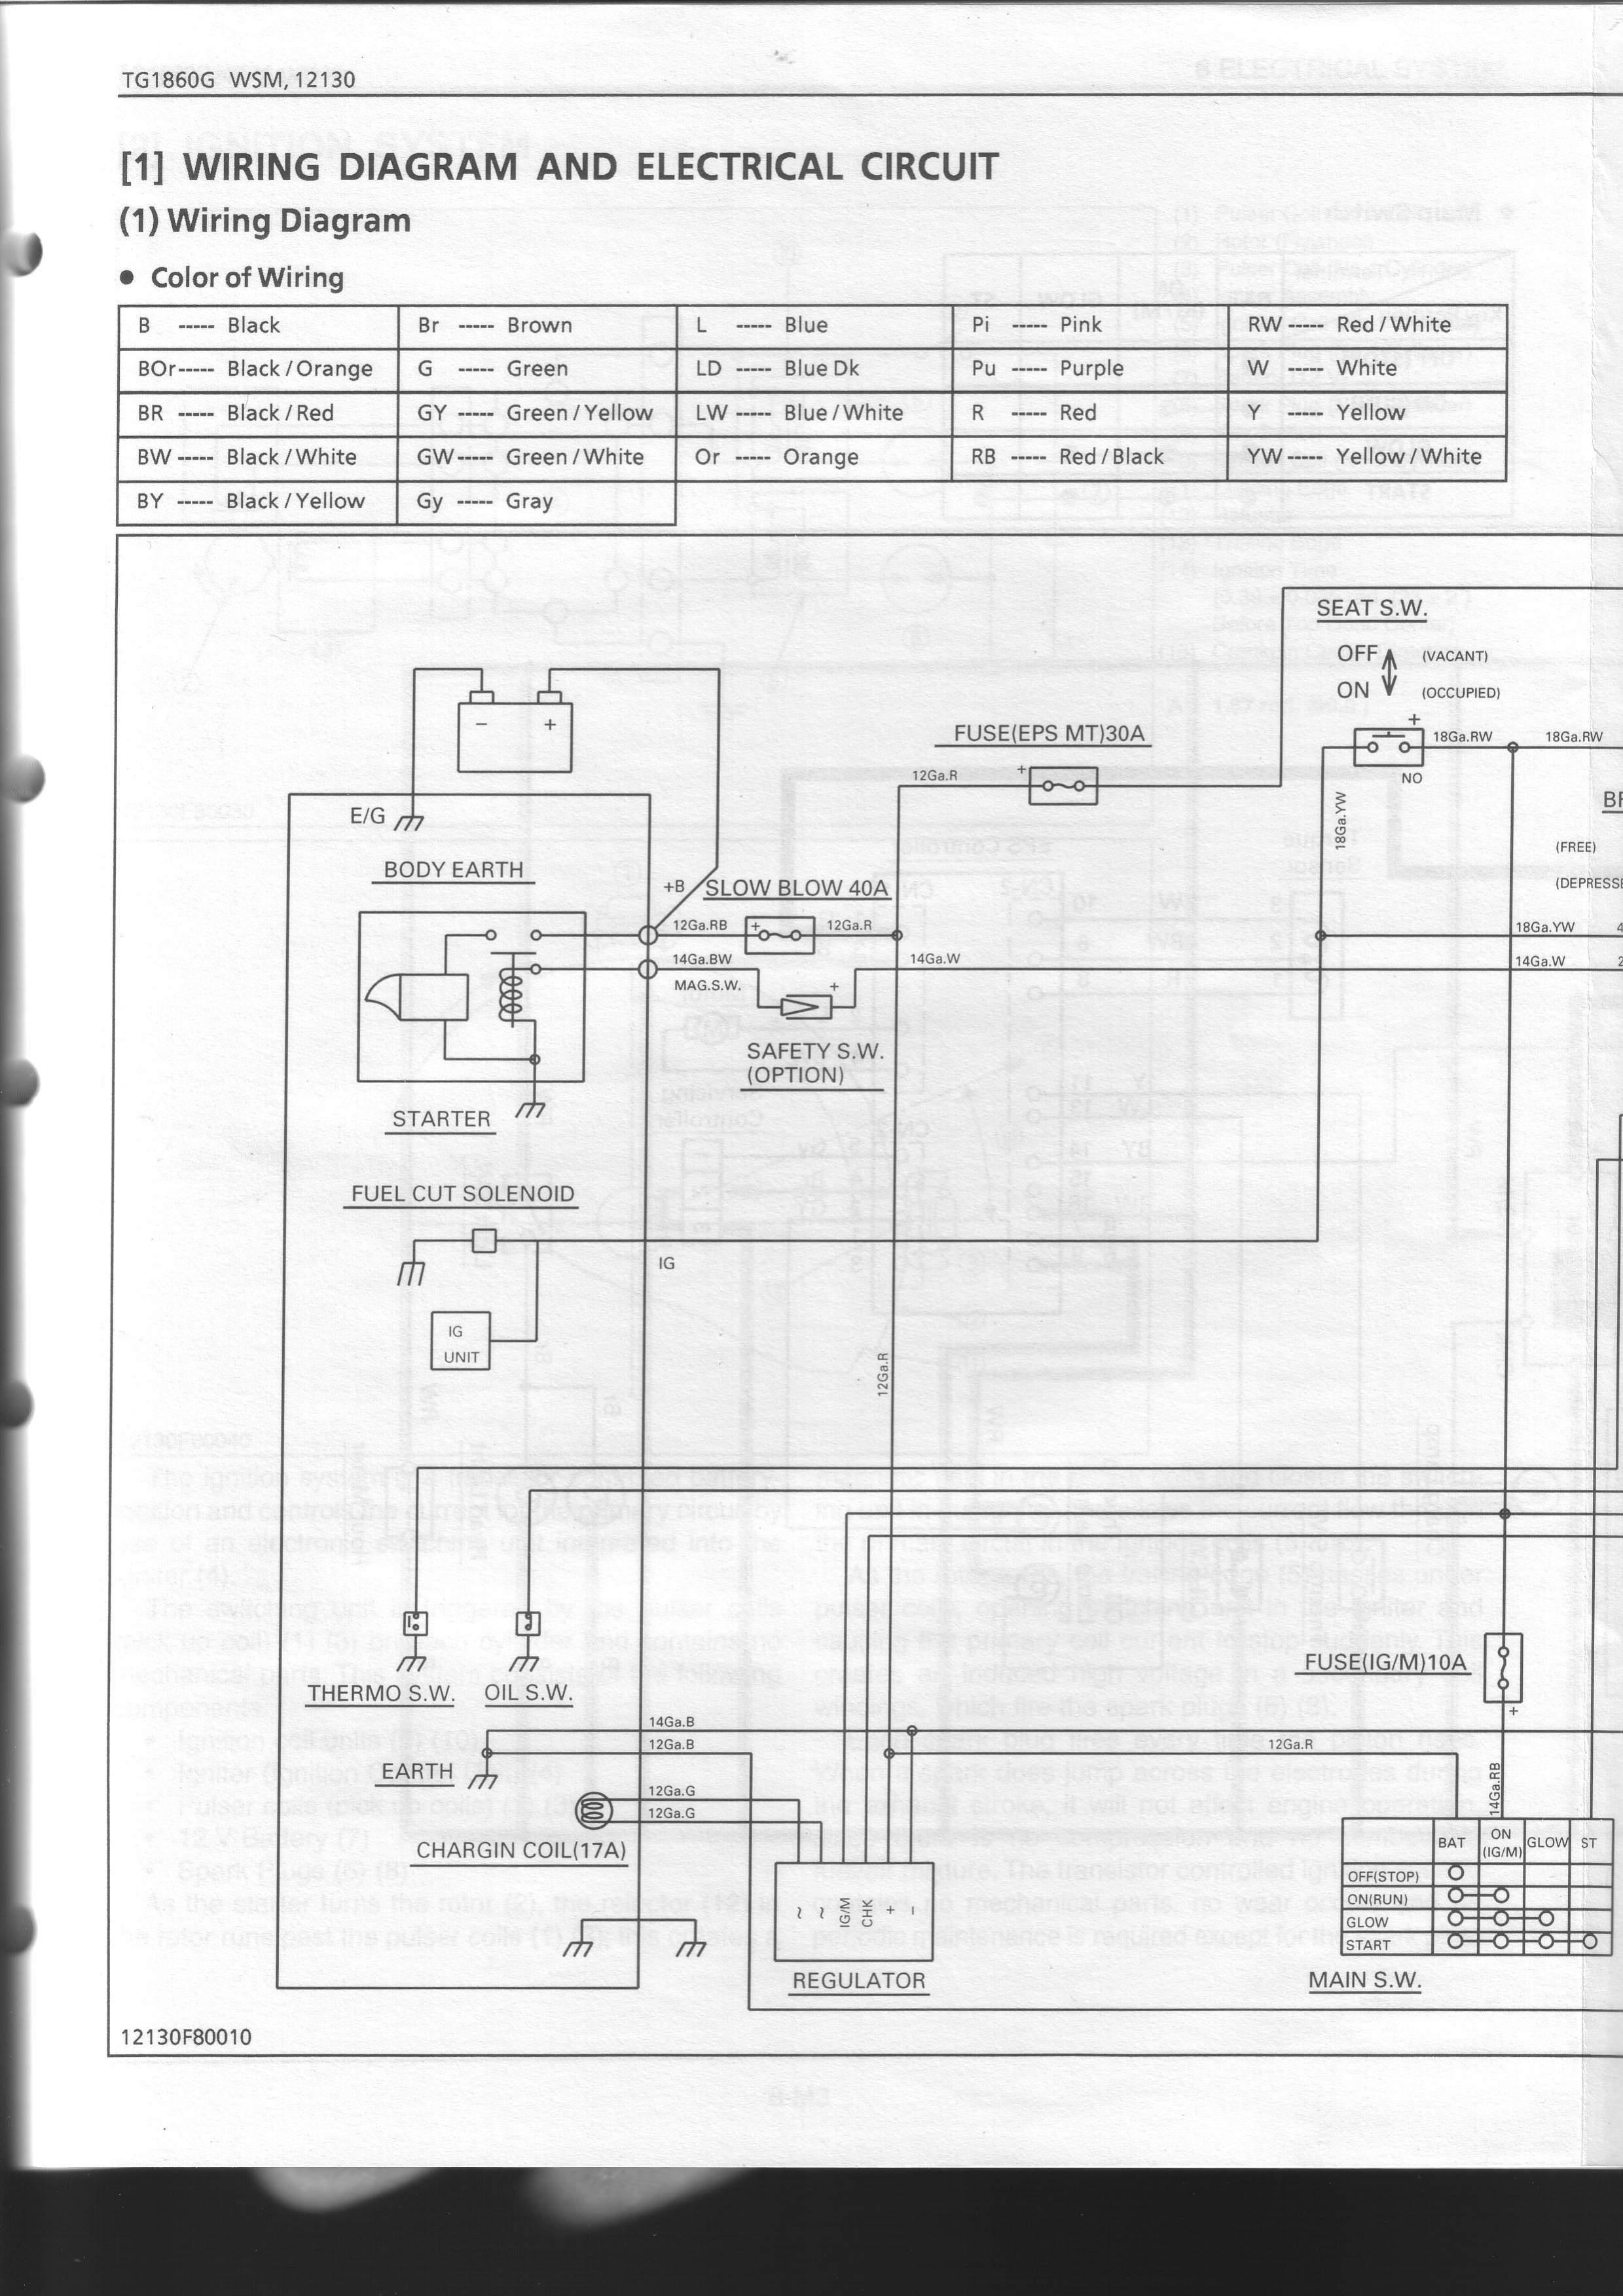 [SCHEMATICS_48EU]  FK_3390] Kubota Tg1860G Wiring Diagram Download Diagram   Kubota Diesel Zero Turn Mowers Wiring Diagram 2002      Eumqu Embo Vish Ungo Sapebe Mohammedshrine Librar Wiring 101